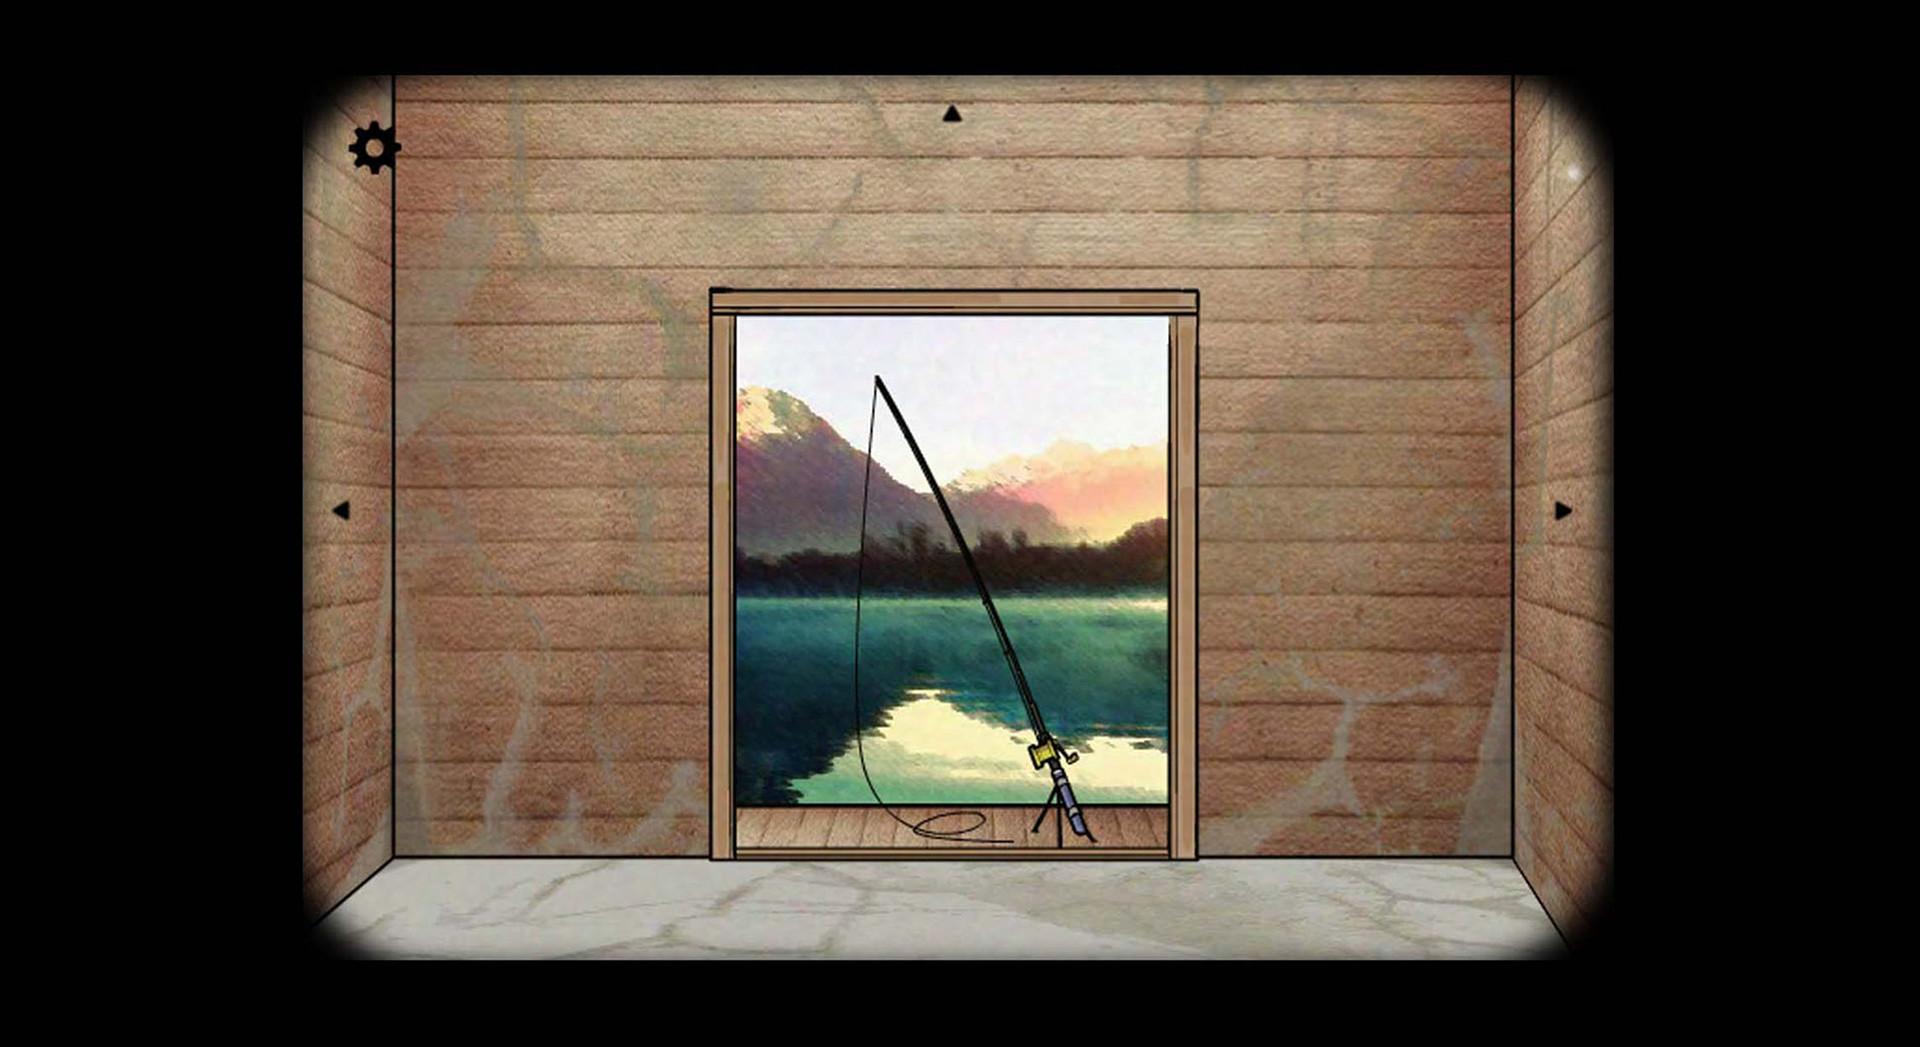 cube-escape-collection-pc-screenshot-03